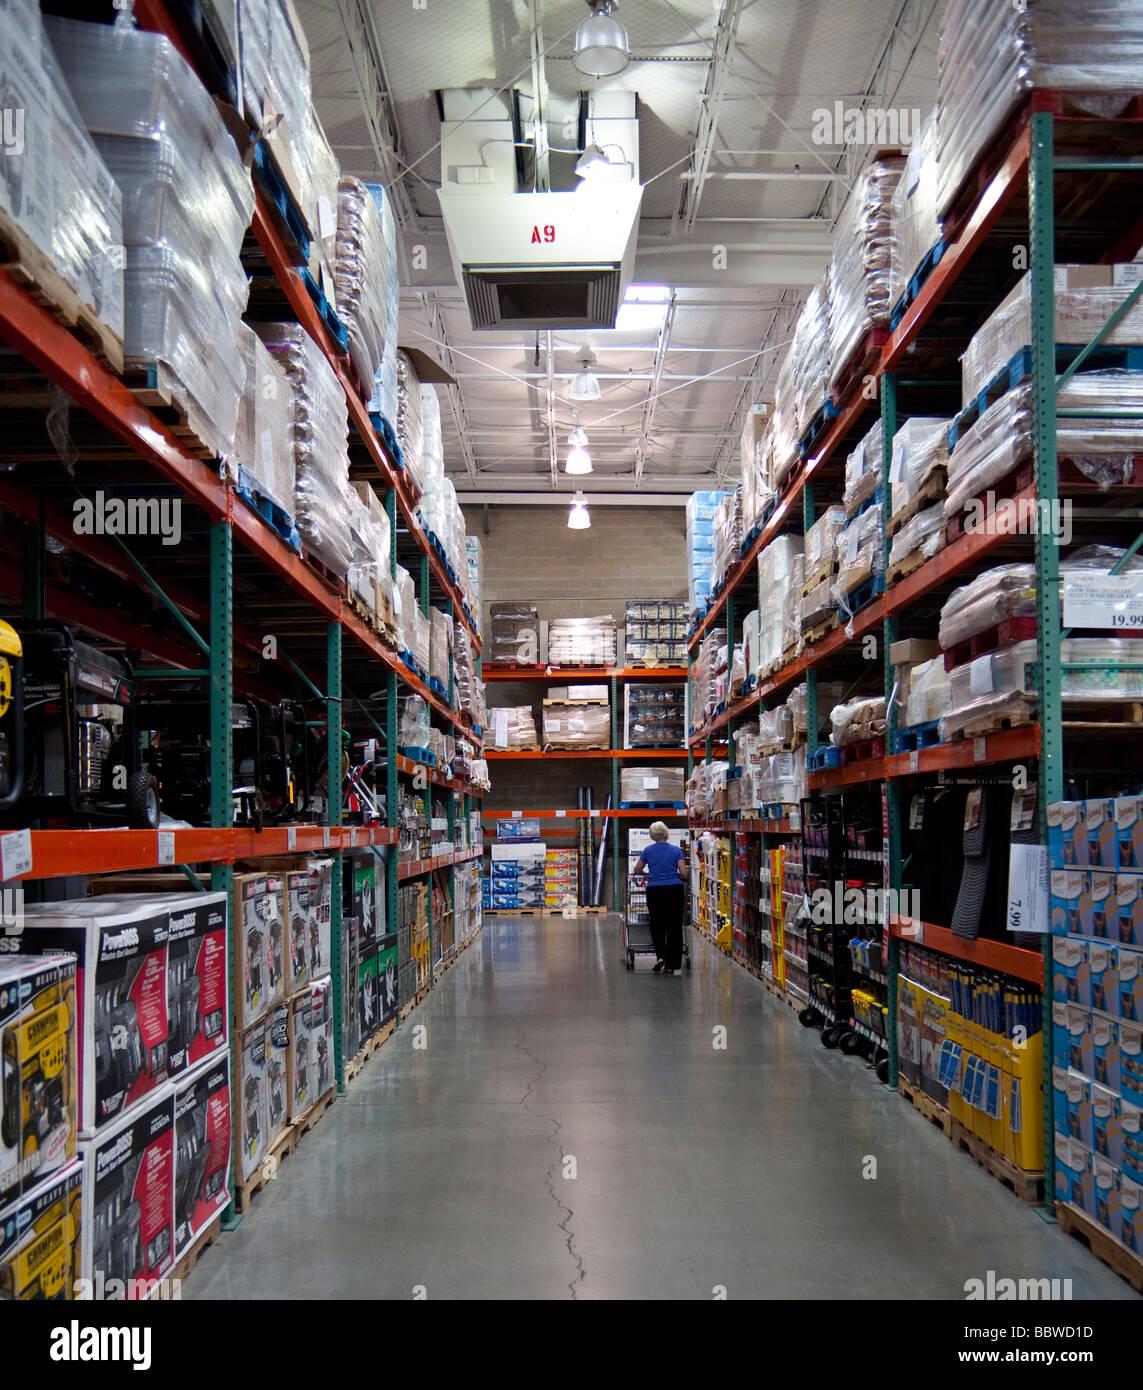 Auto Mart Usa >> automobile accessories products, Costco warehouse USA Stock Photo: 24530617 - Alamy